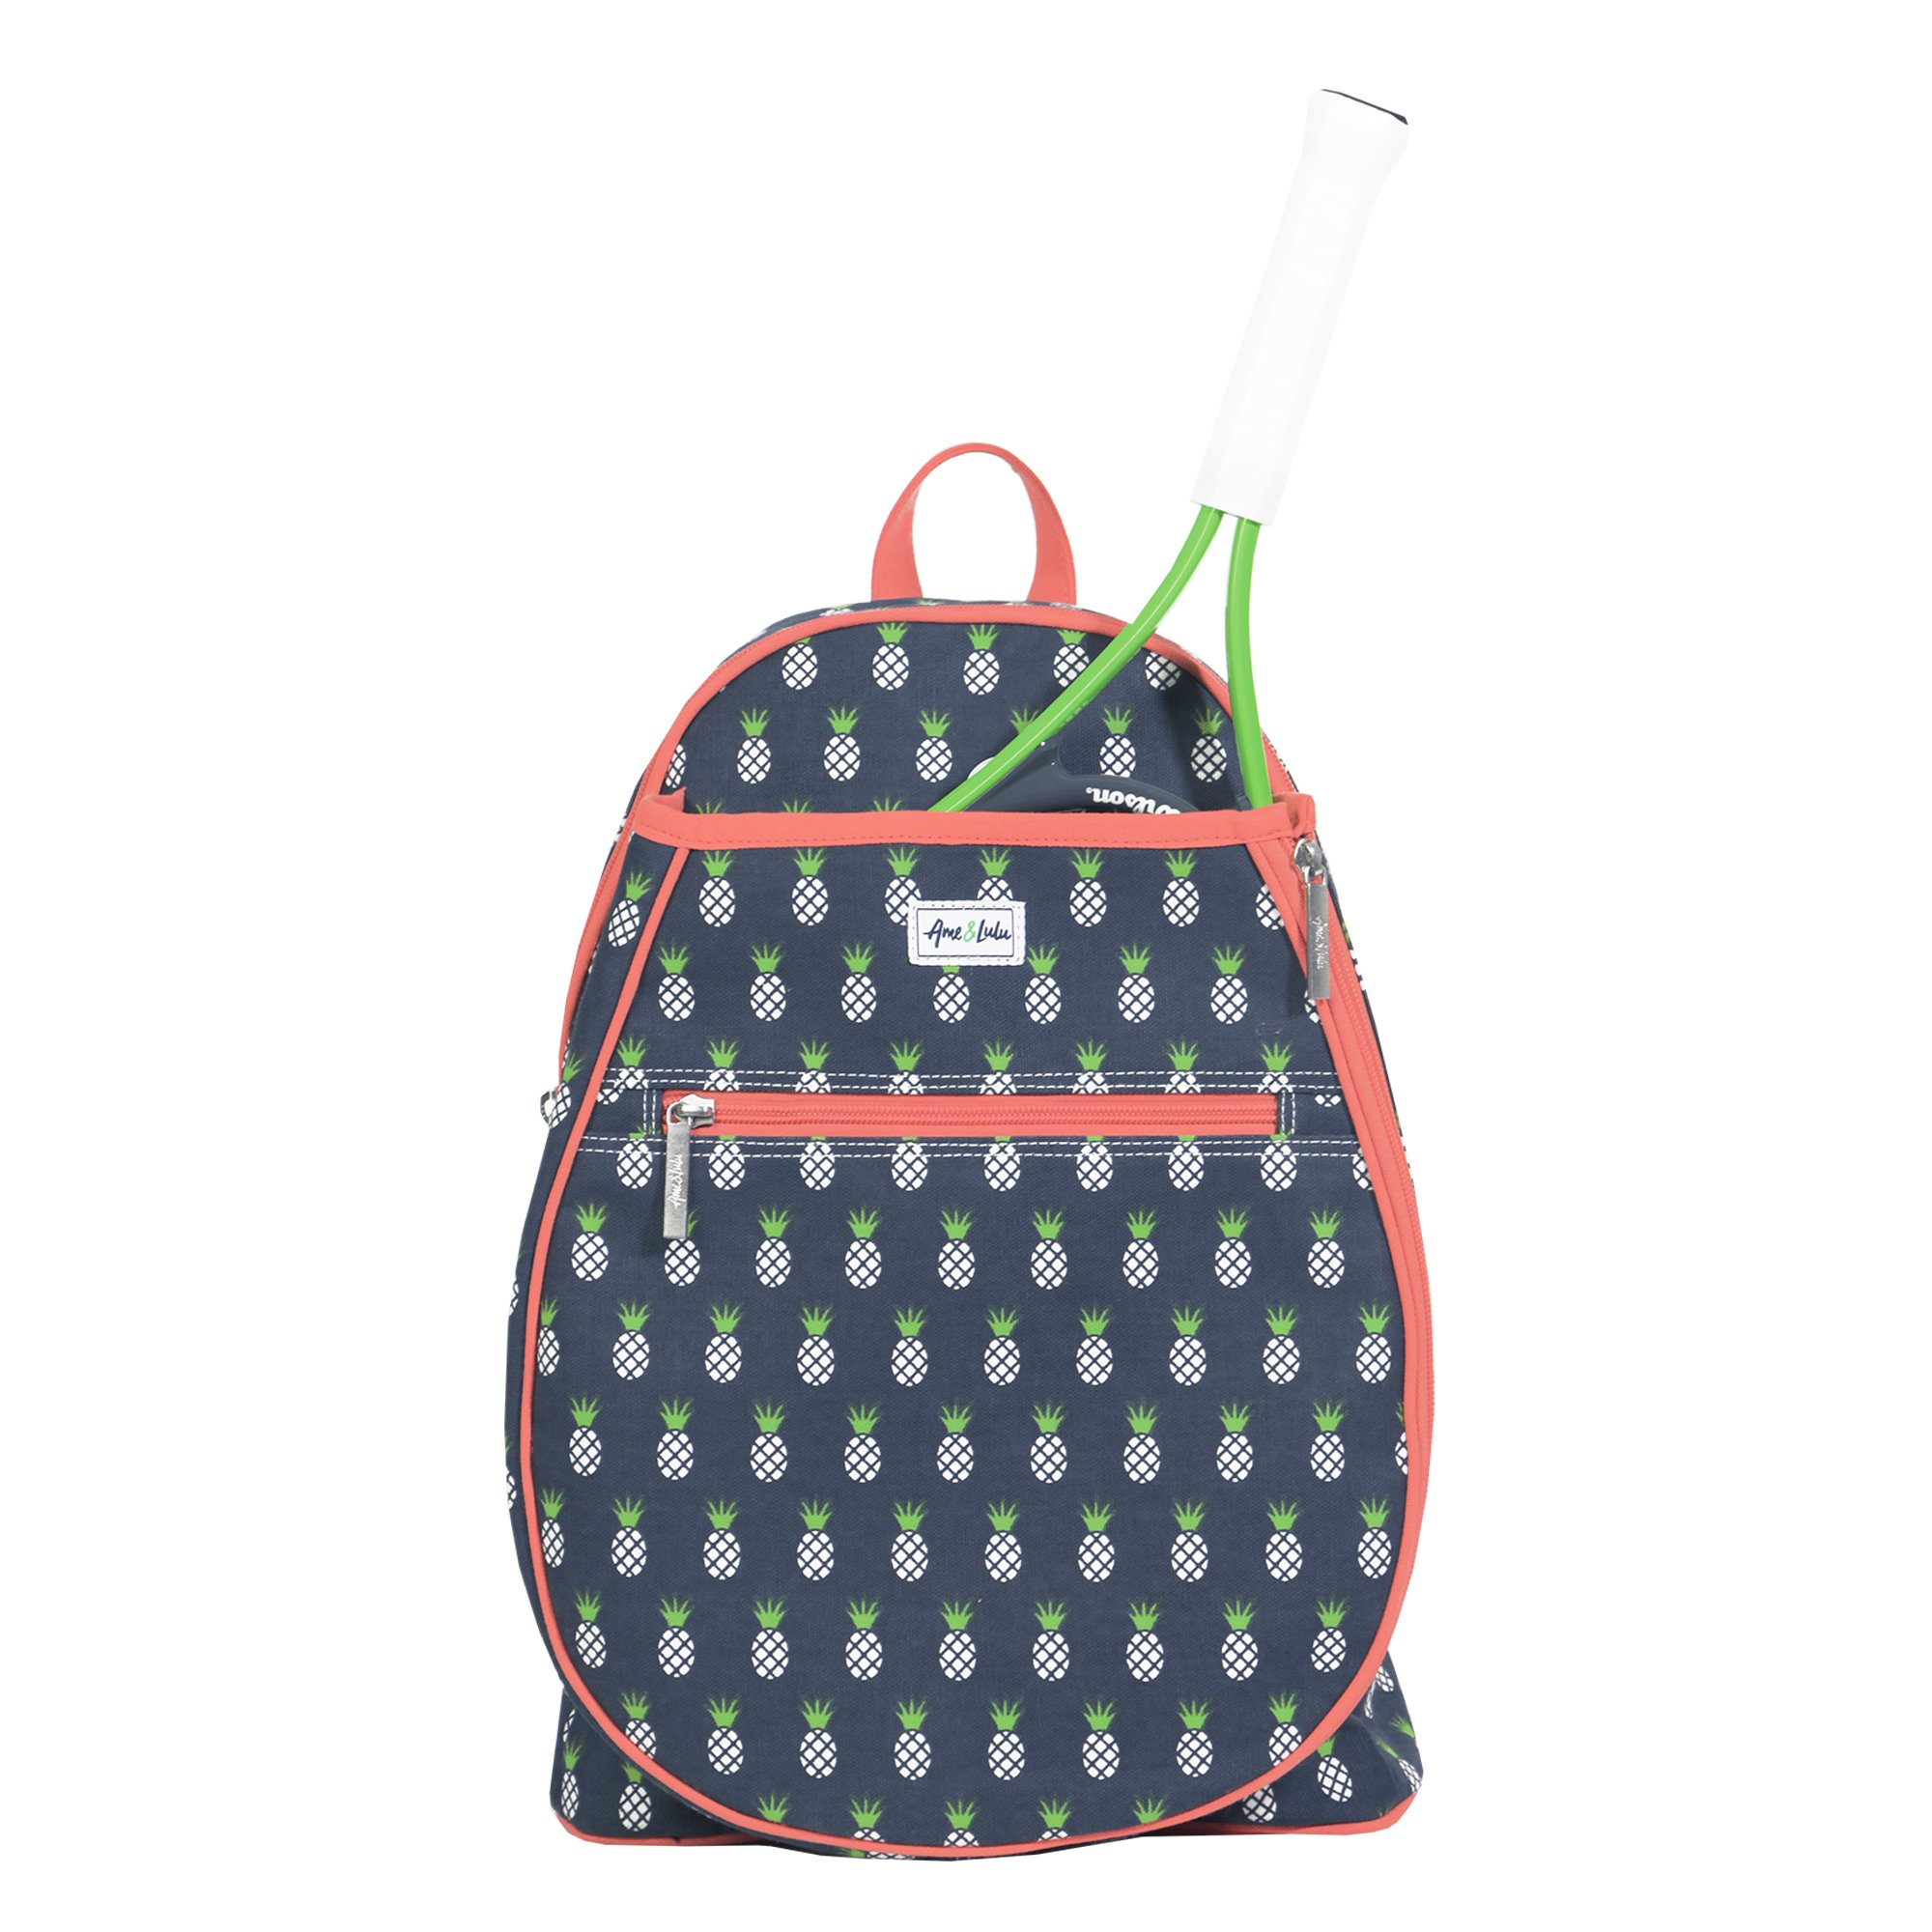 Ame and Lulu Pineapple Tennis Backpack